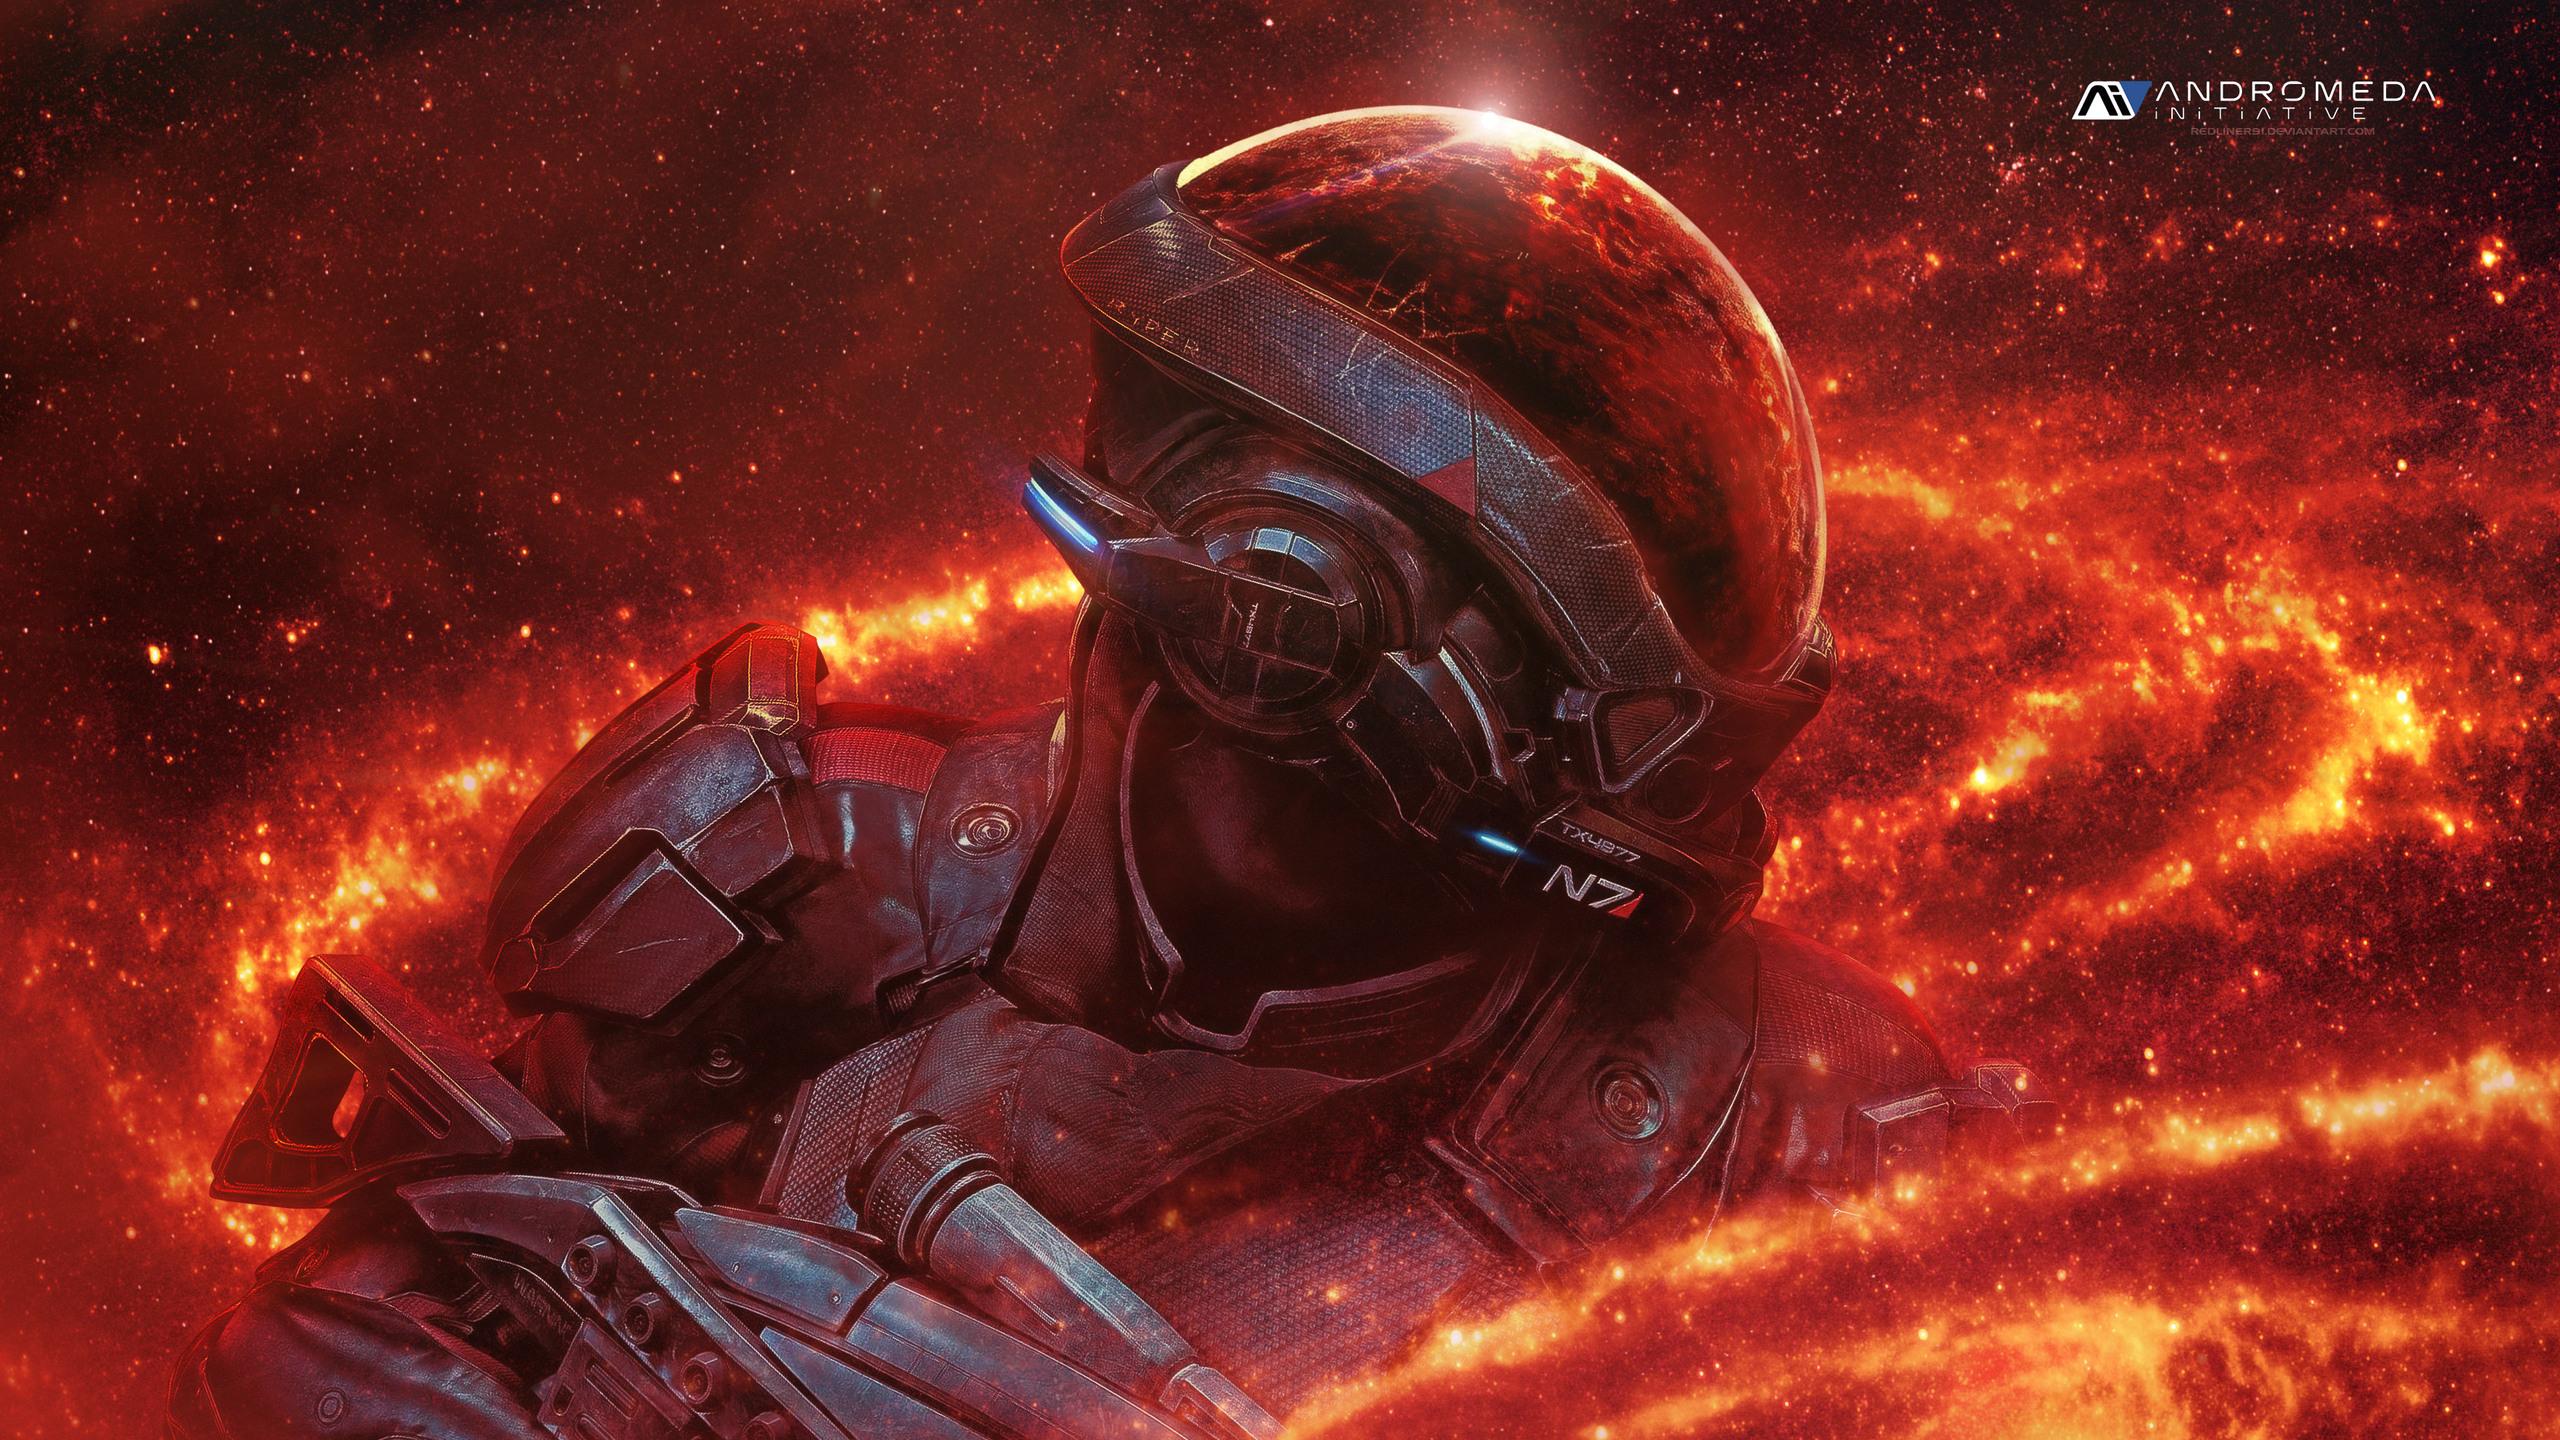 2560x1440 Mass Effect Andromeda Ryder N7 4k 1440p Resolution Hd 4k